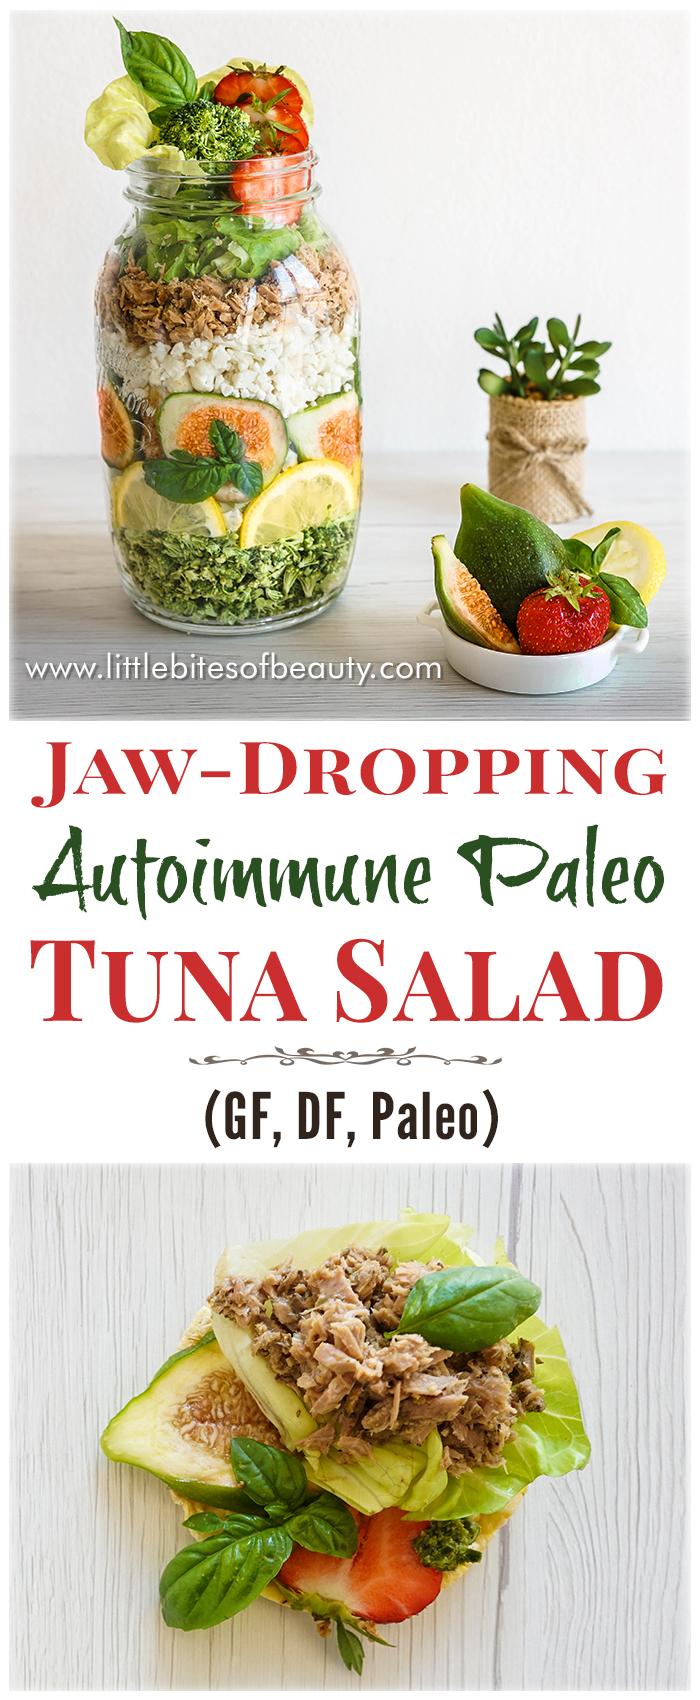 autoimmune paleo tuna salad